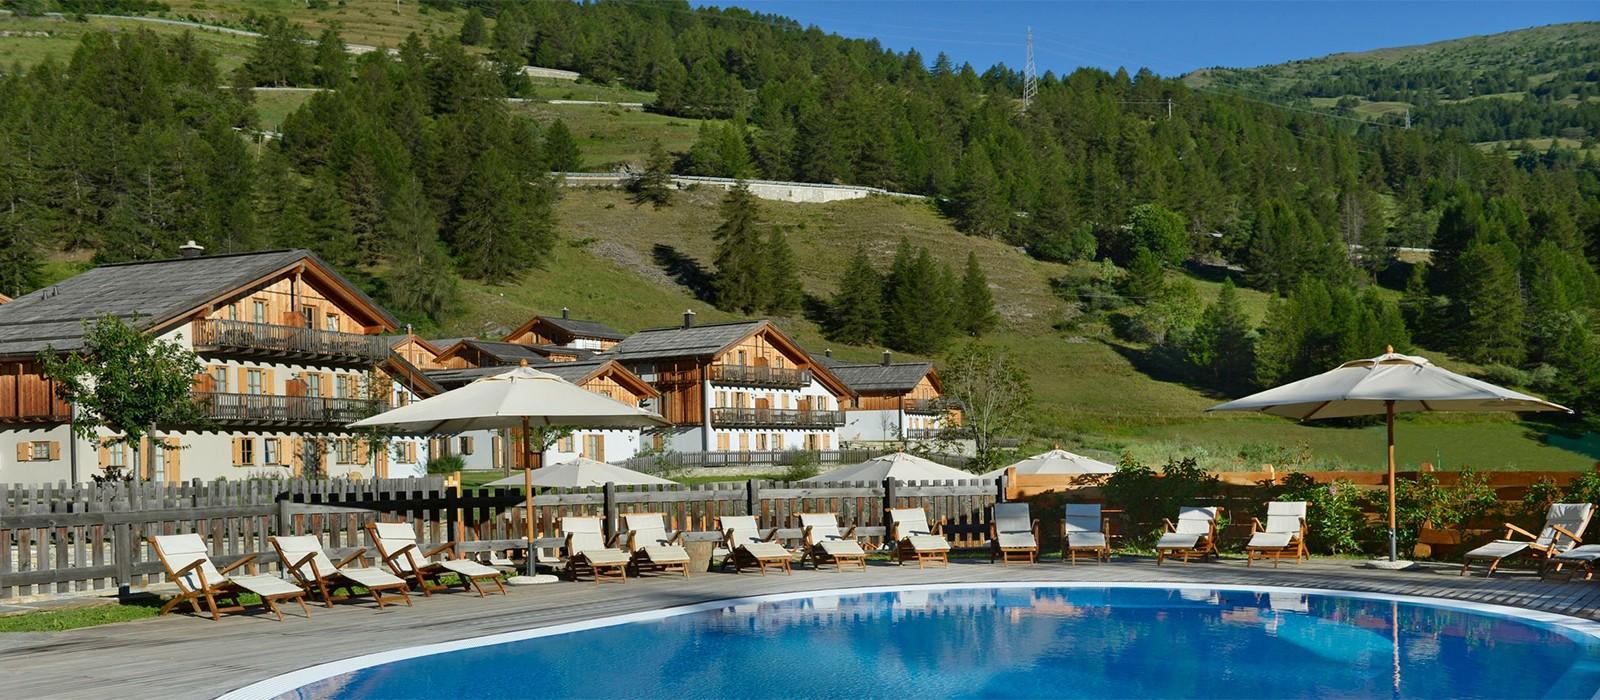 Pragelato Vialetta - Luxury Italy Holiday Packages - Header